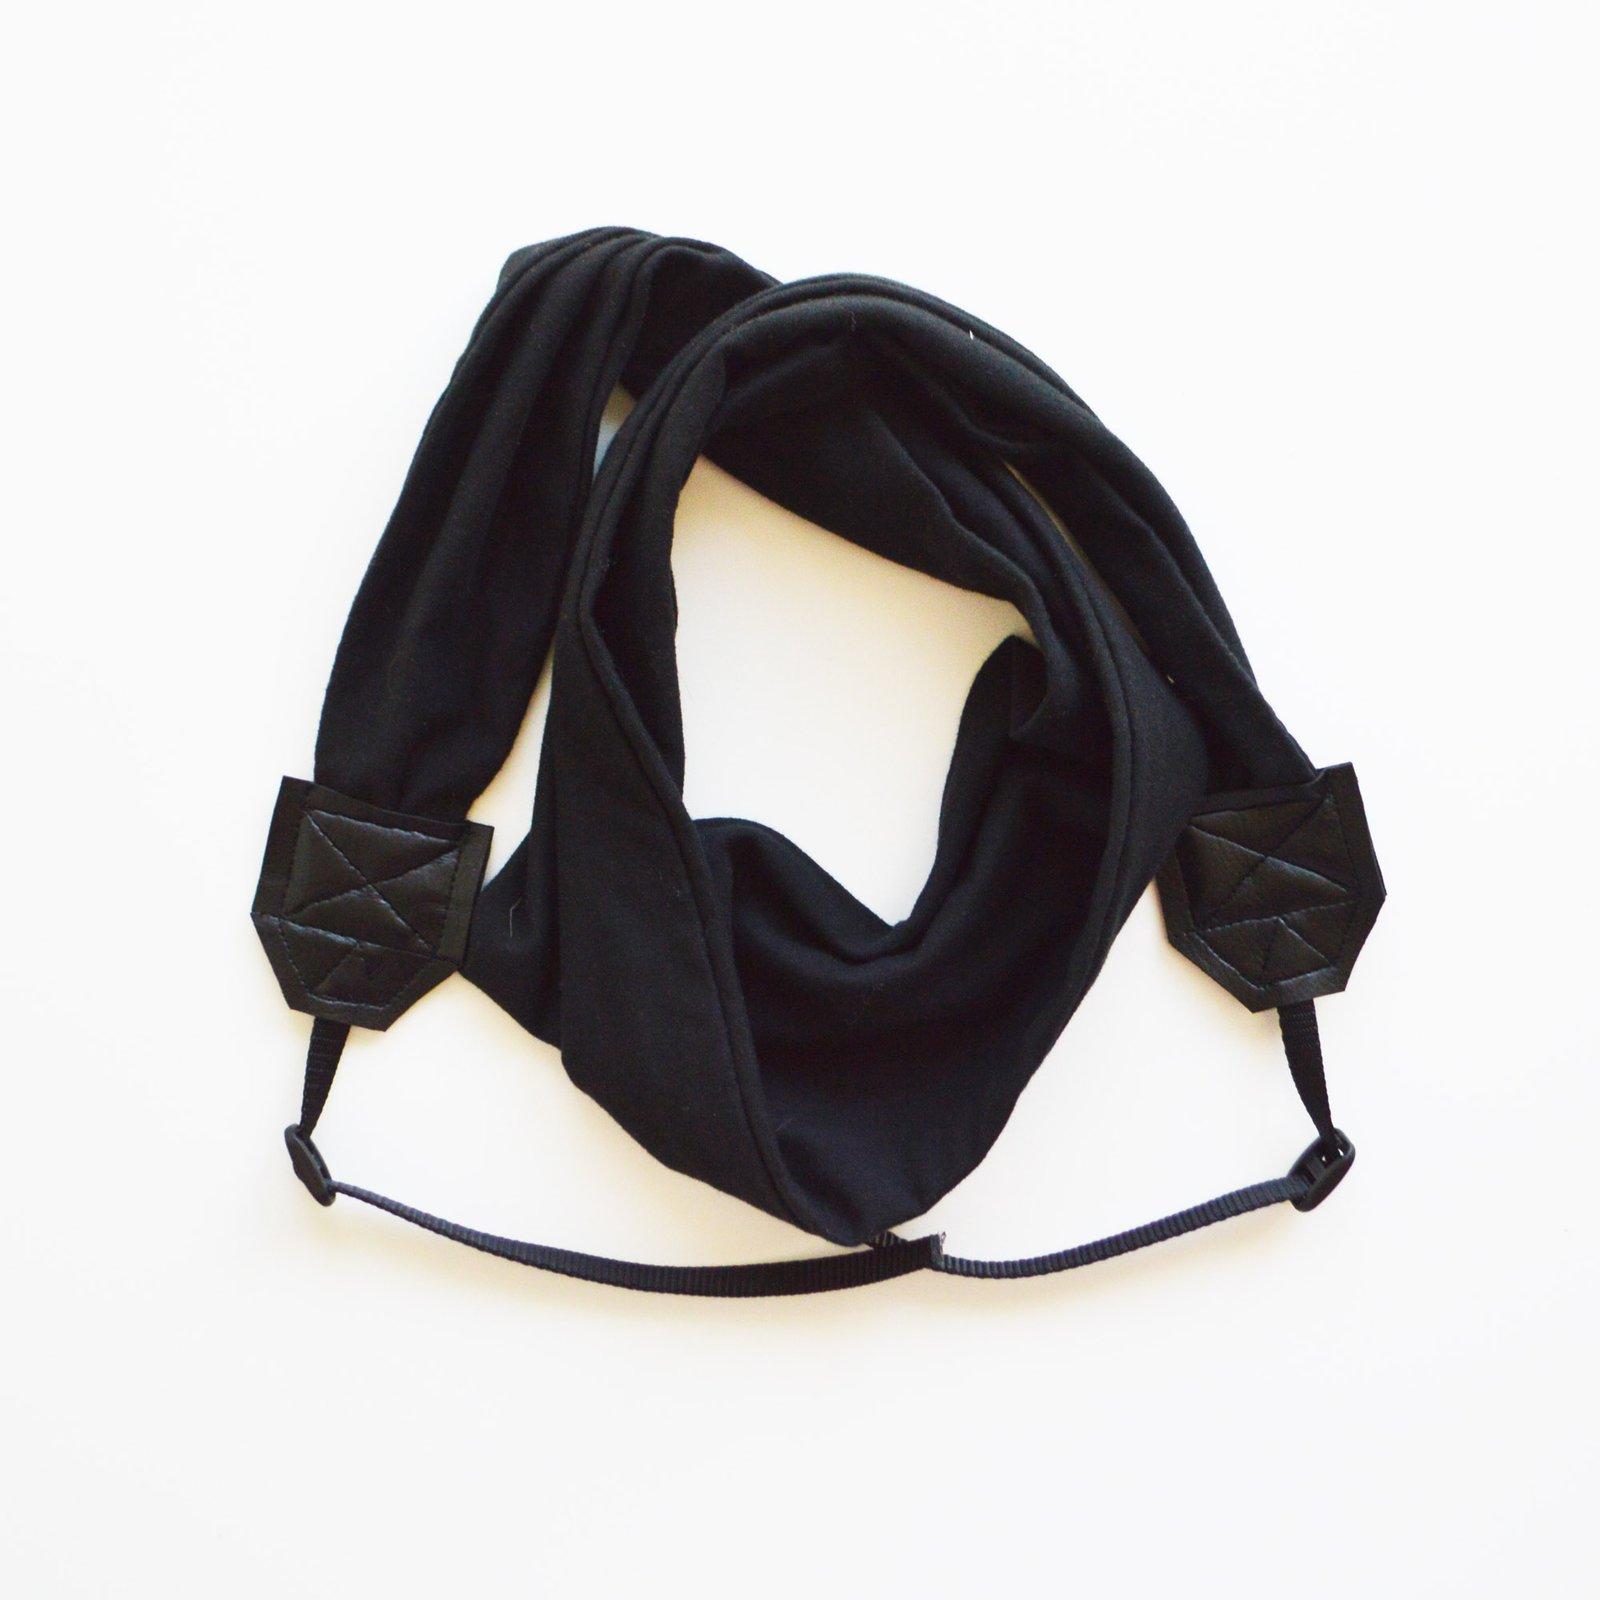 USA Handmade UT  By Women Ready to Ship Scarf Camera Strap Cross body Super Soft Stretch Knit Photographer Gift Idea Free US Shipping